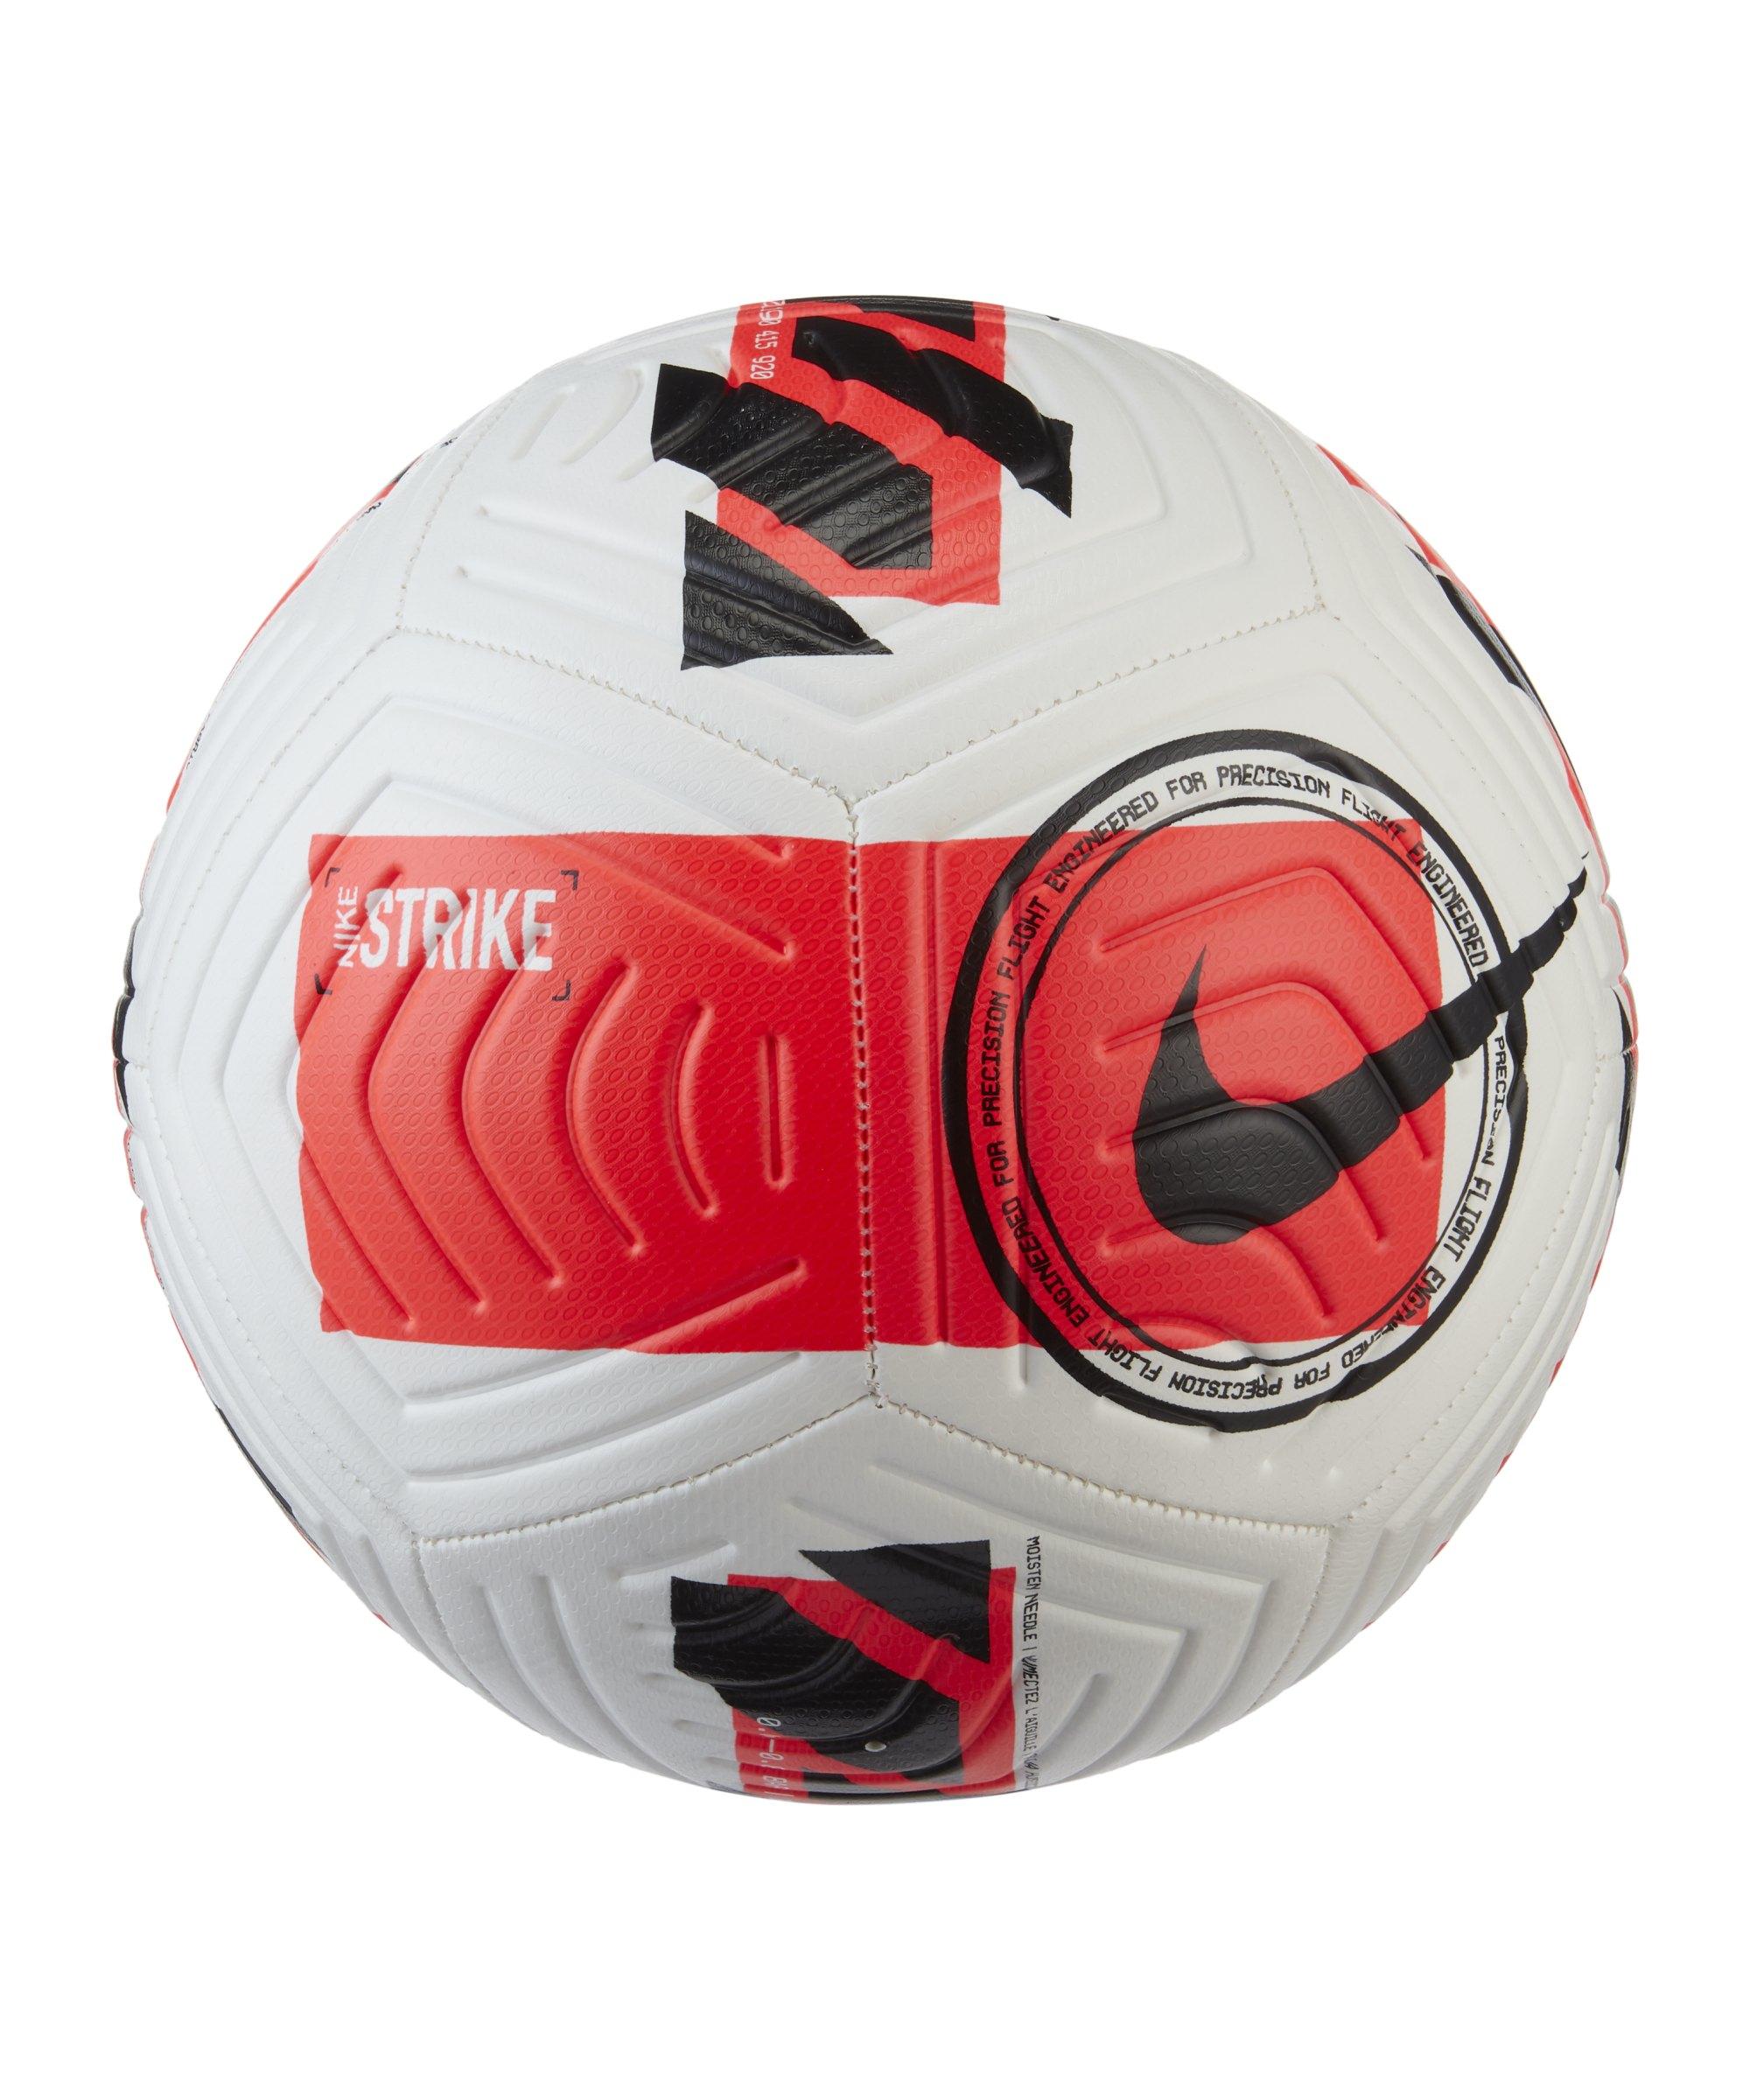 Nike Strike Trainingsball Weiss Rot Schwarz F100 - weiss